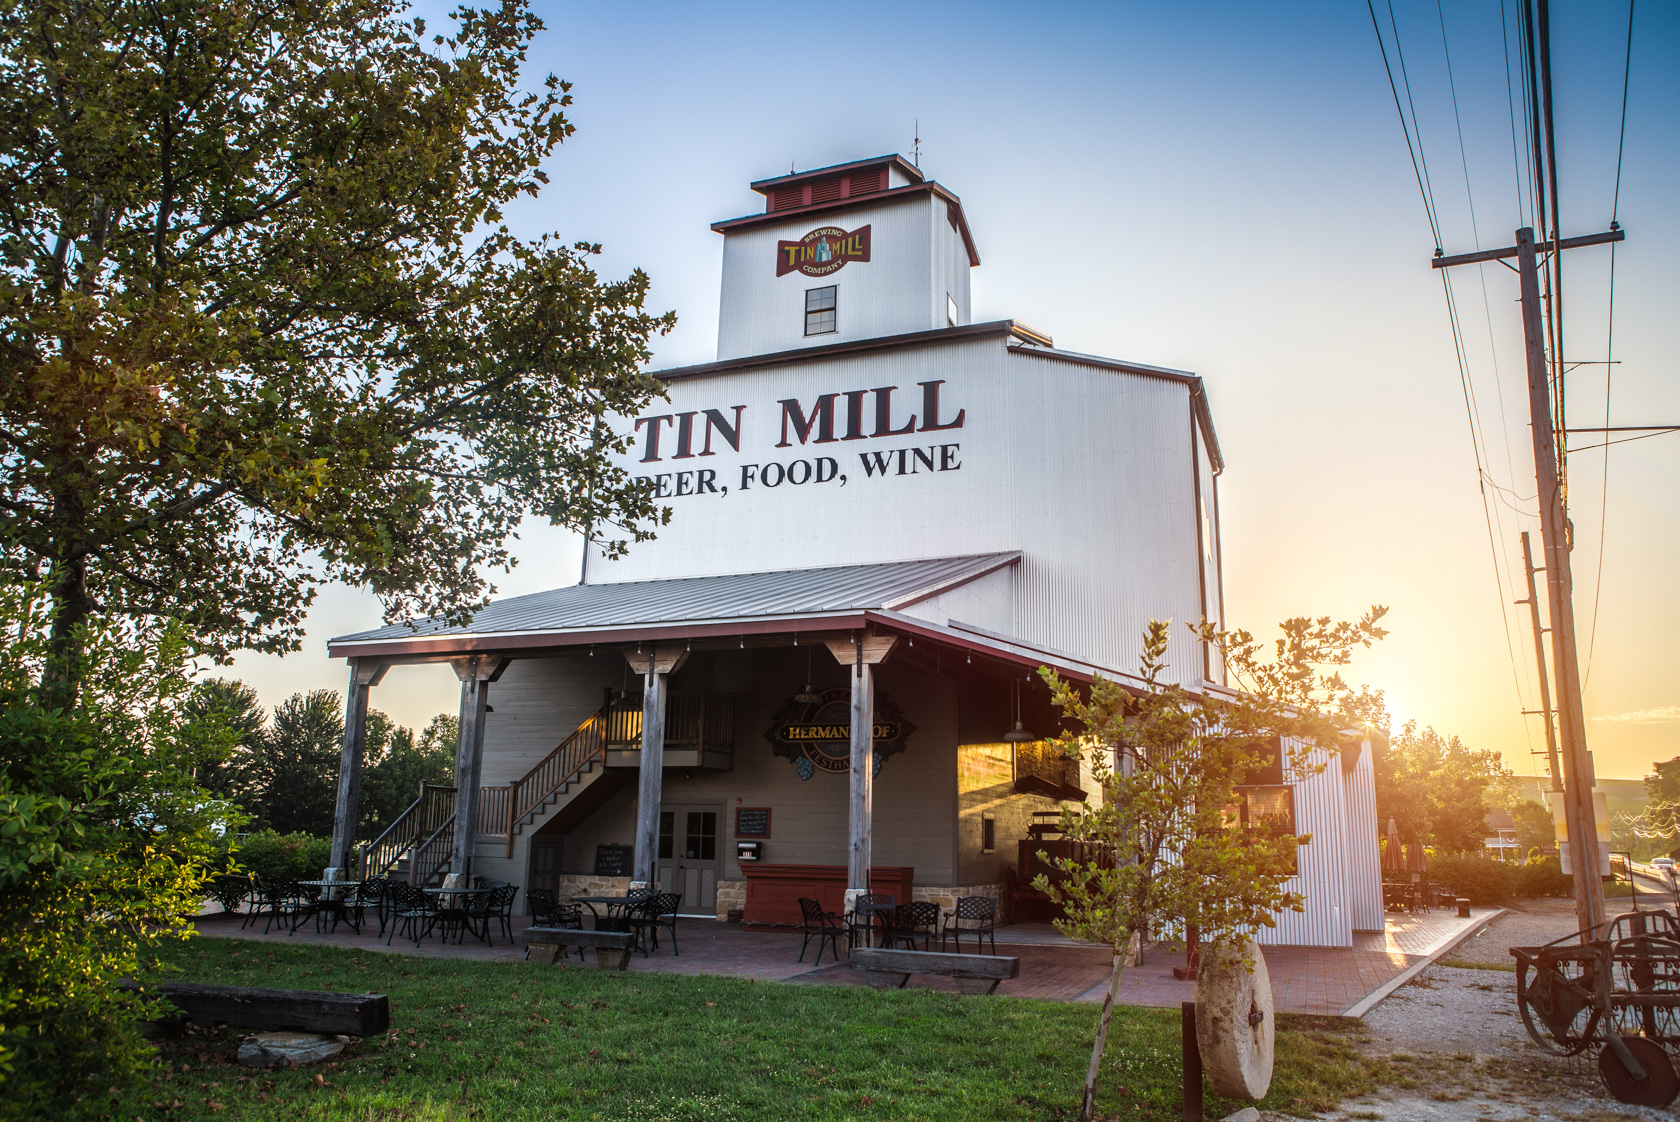 Tin Mill Steakhouse